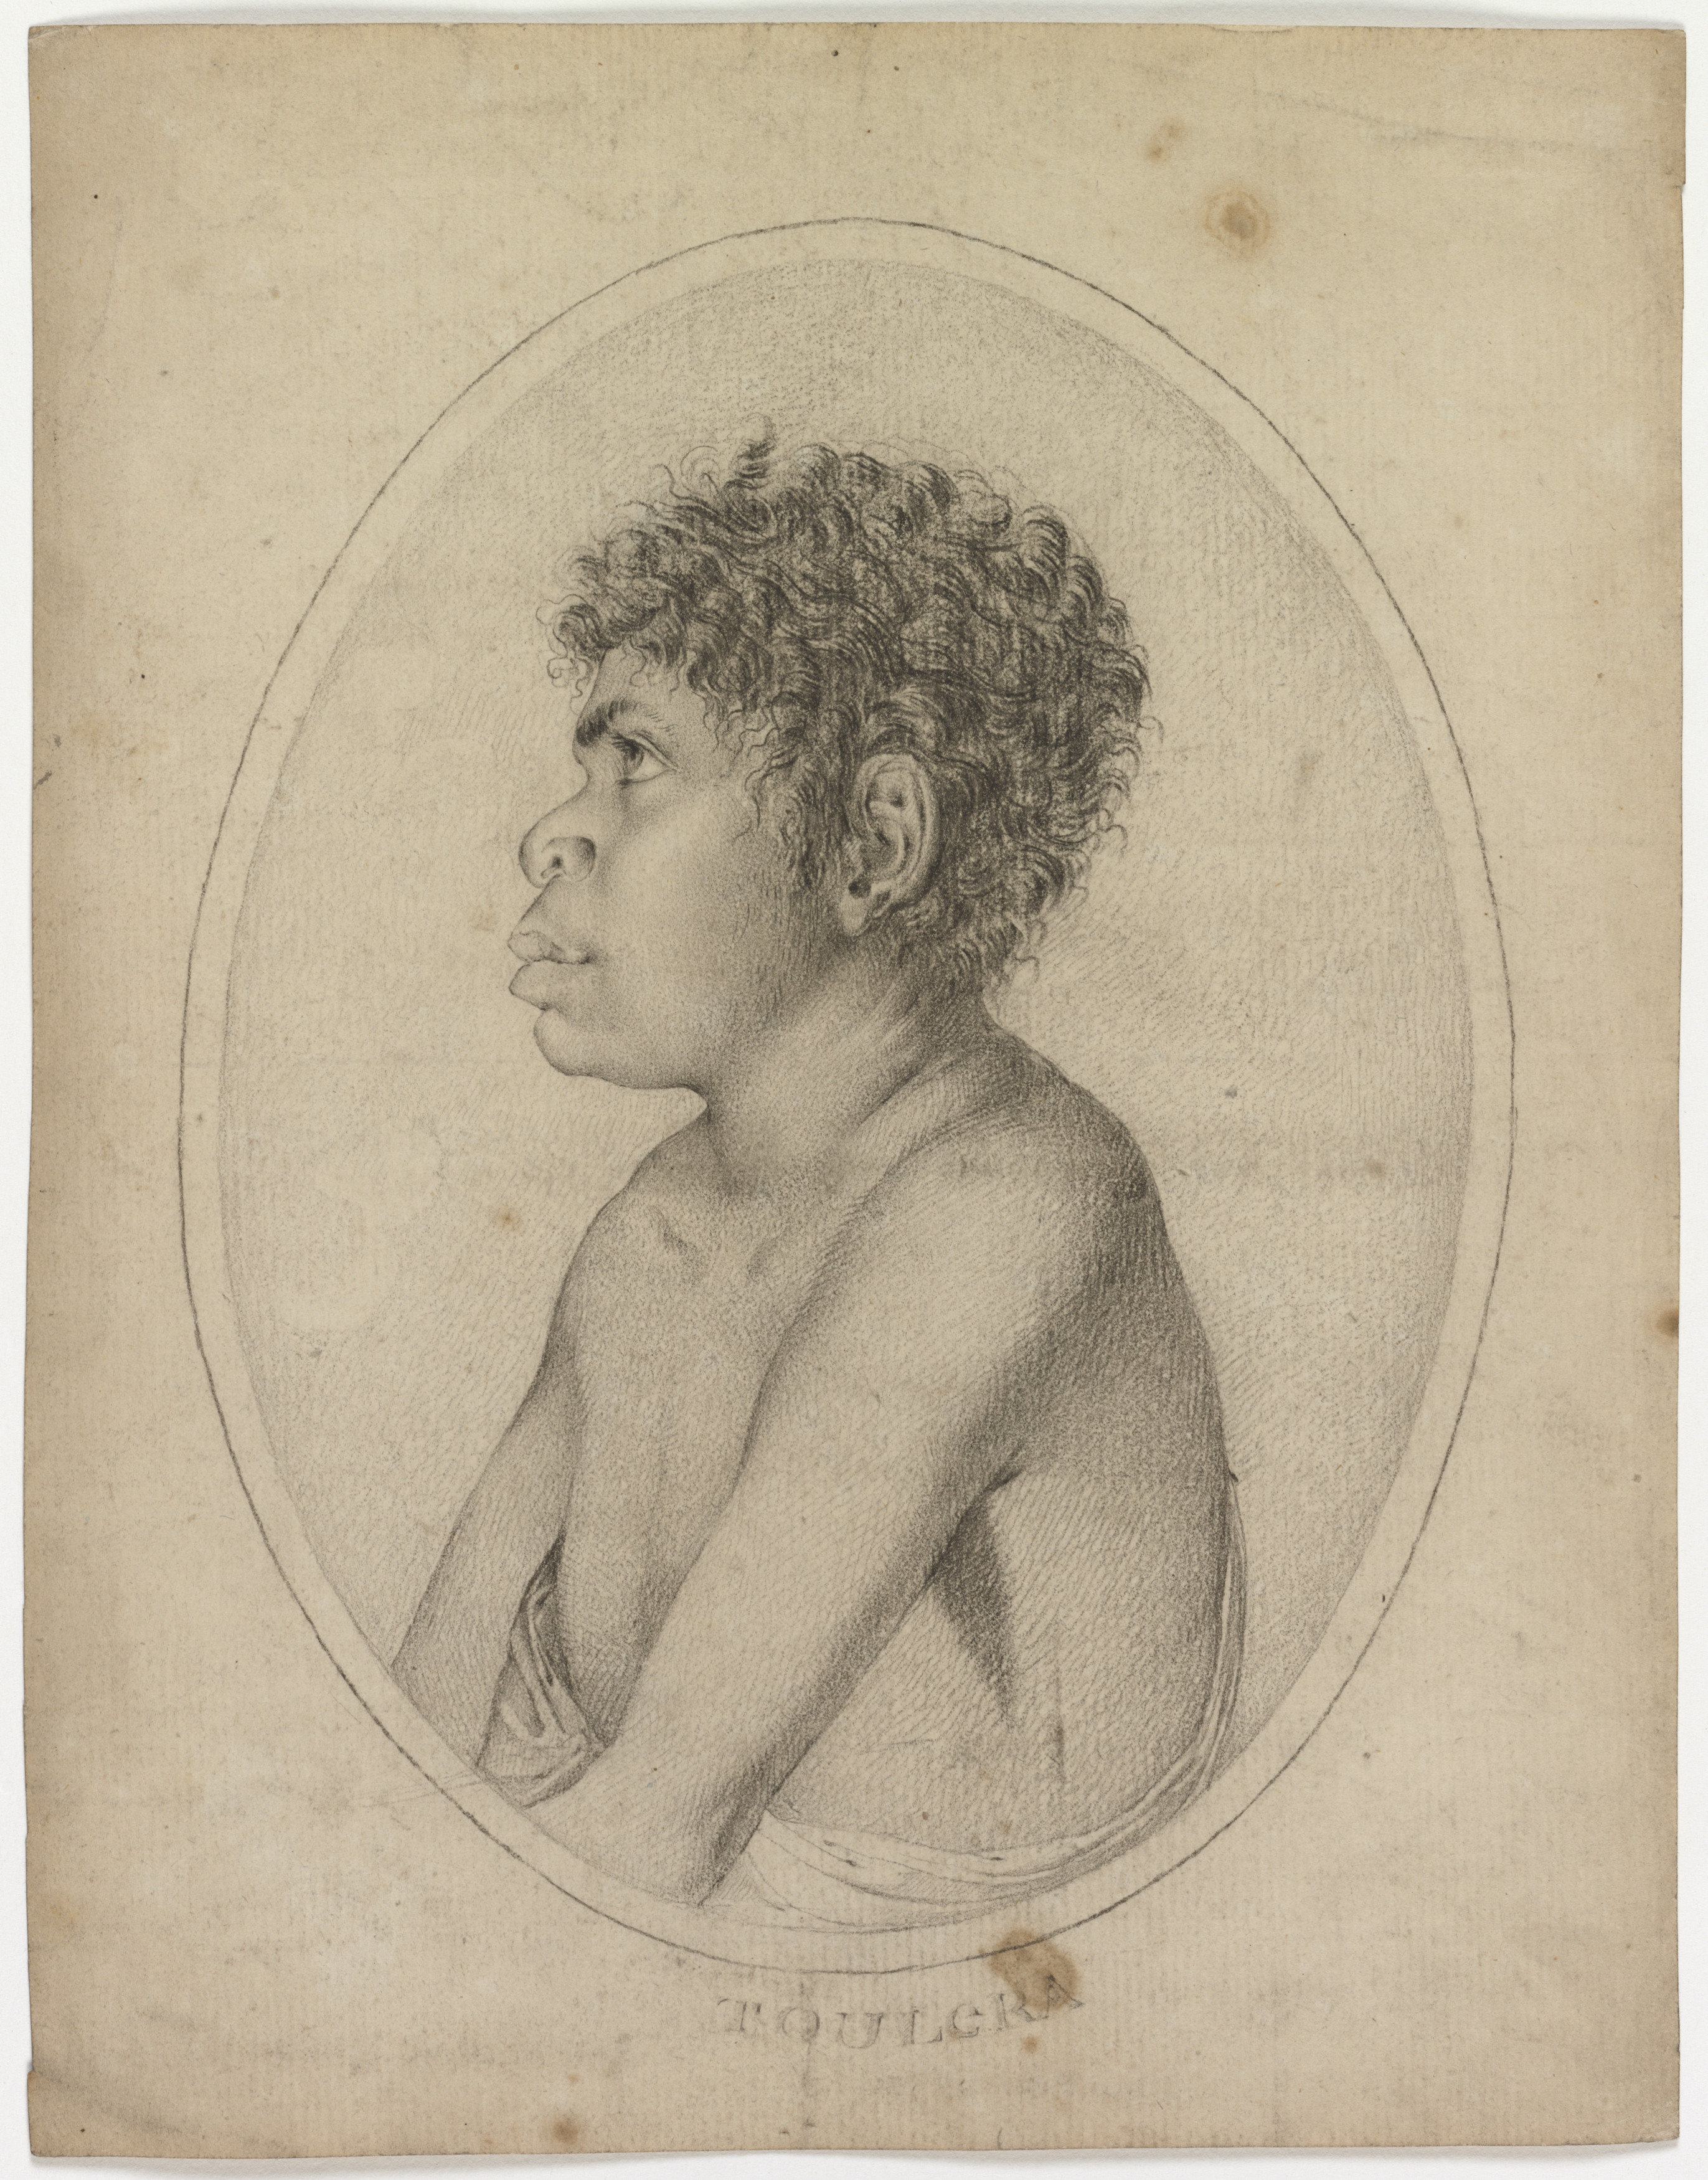 A black pencil or dark graphite sketch on brown paper of an Aboriginal boy.